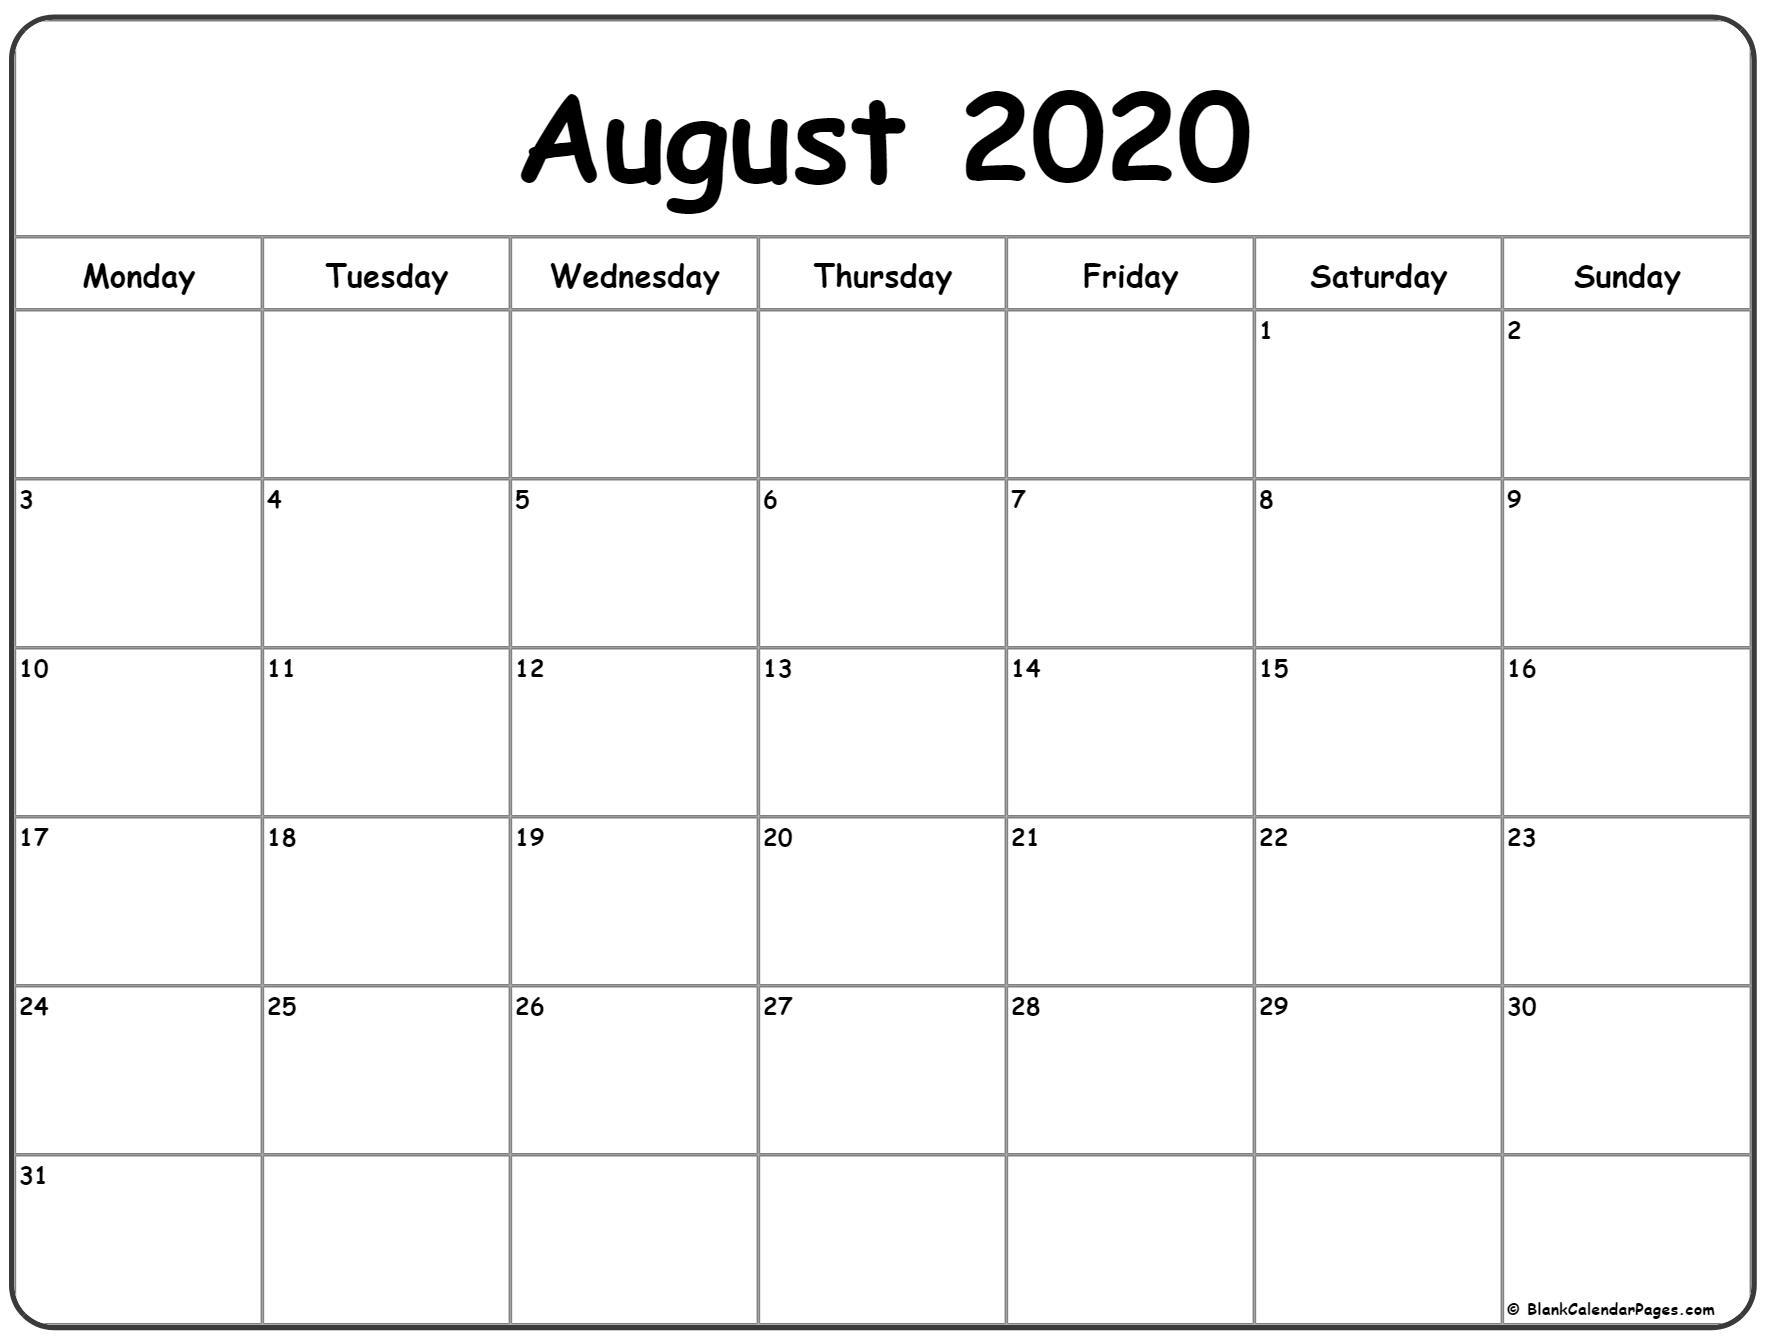 August 2020 Monday Calendar | Monday To Sunday